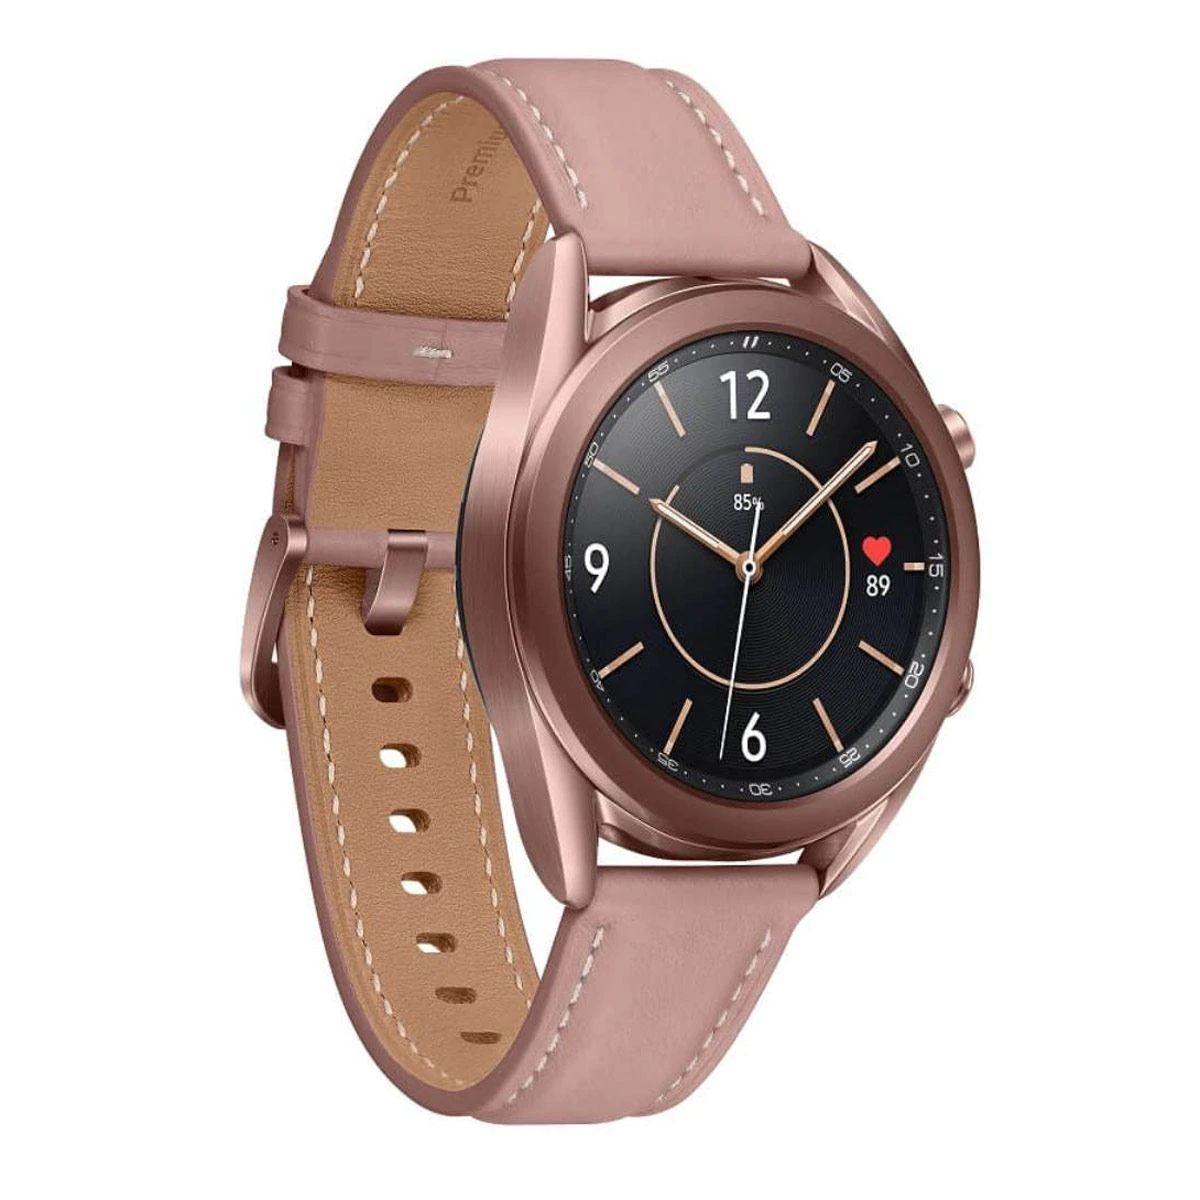 Sanborns Galaxy watch 3 41mm bronce banorte digital.